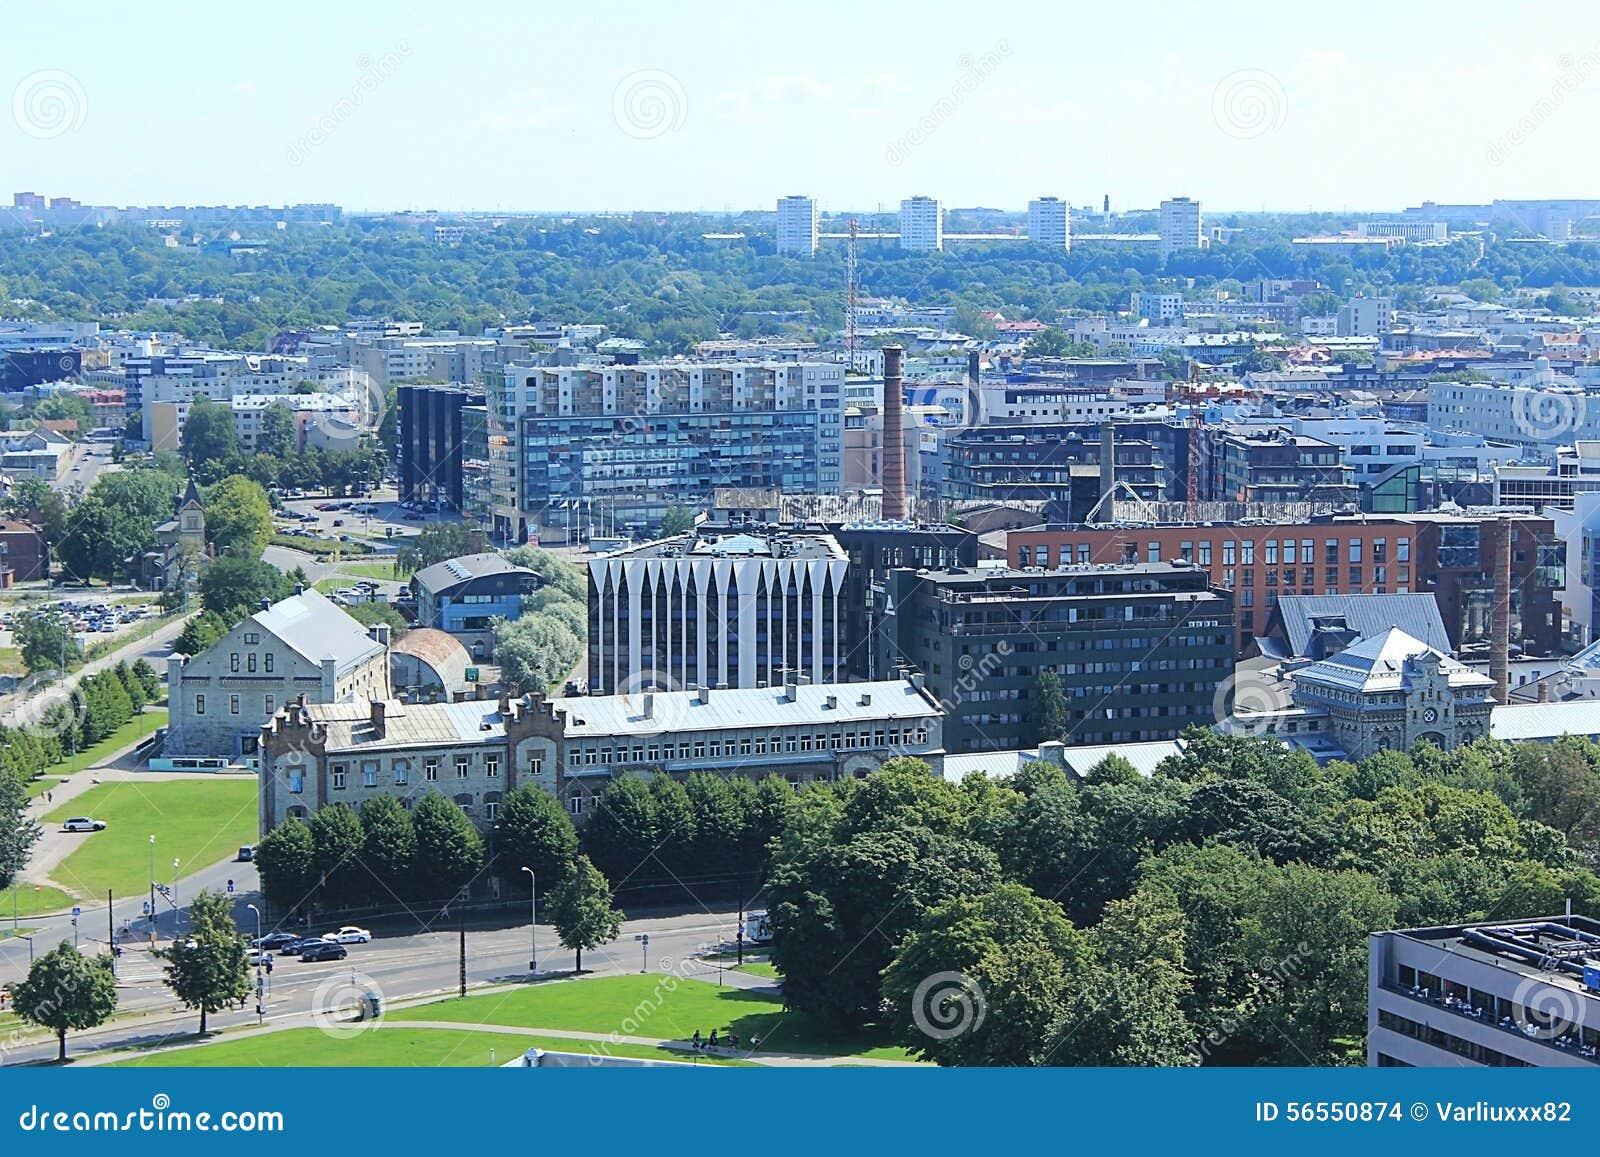 Download Πανόραμα της πόλης Ταλίν εκδοτική στοκ εικόνα. εικόνα από βιομηχανία - 56550874